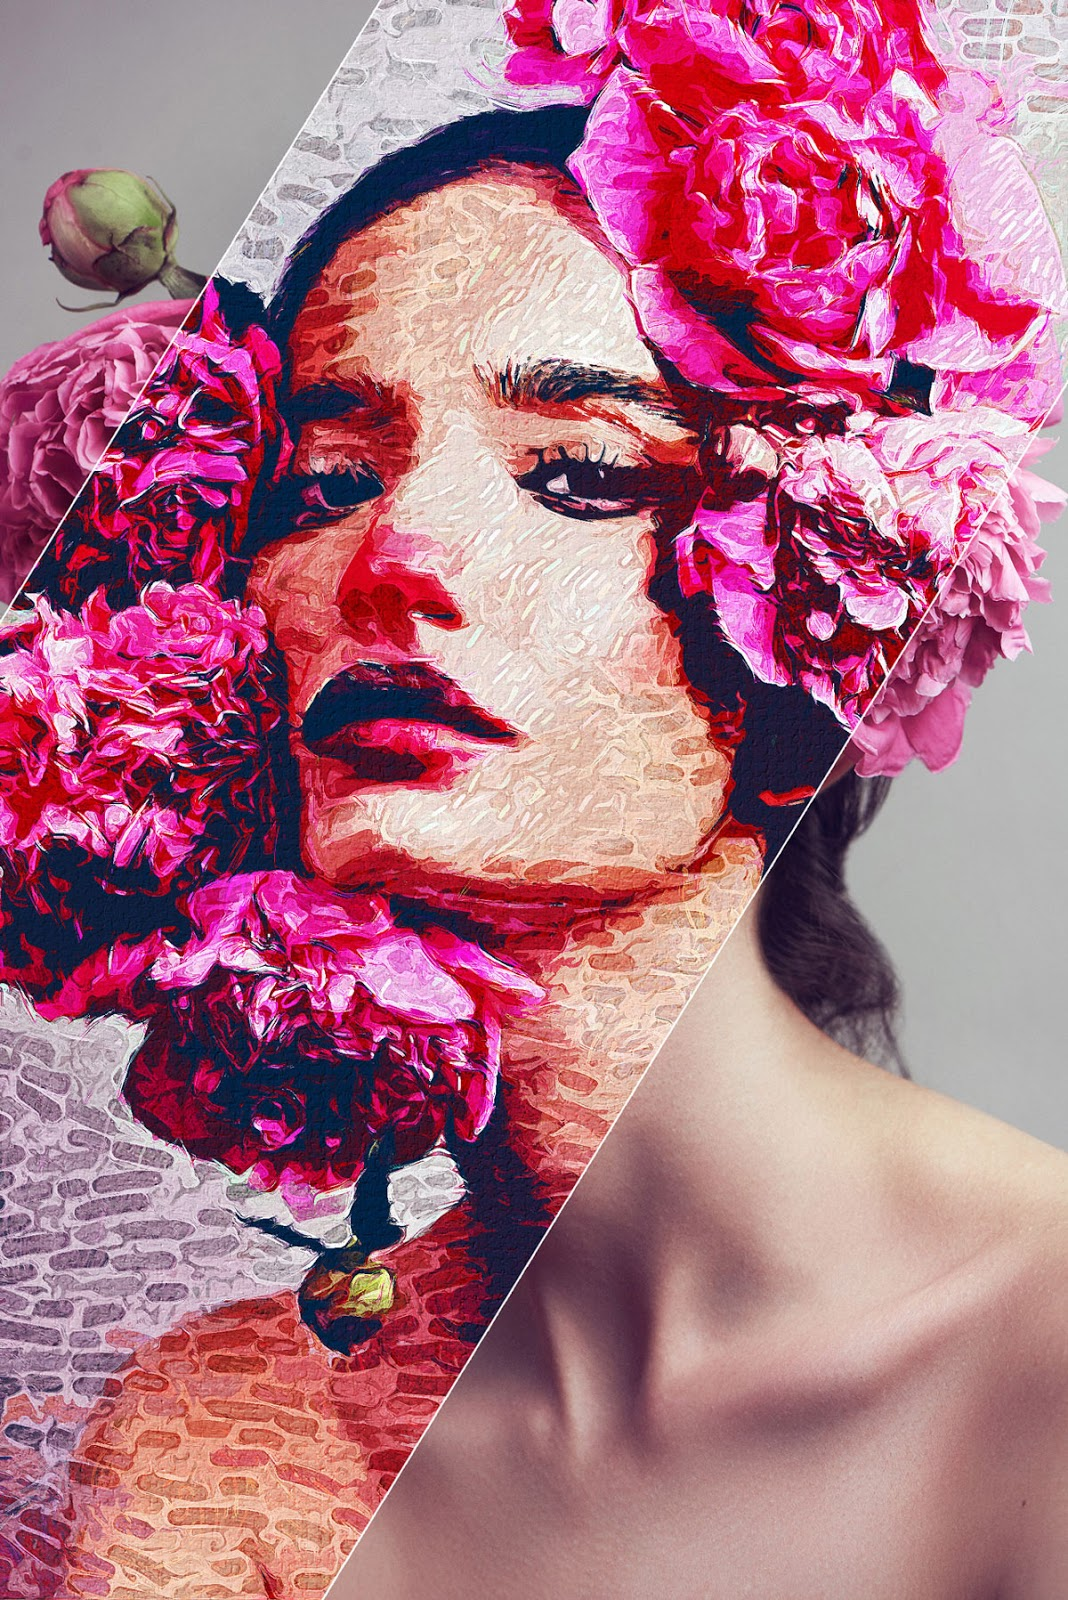 Impressionism Paint FX   Photoshop Add On 27734189